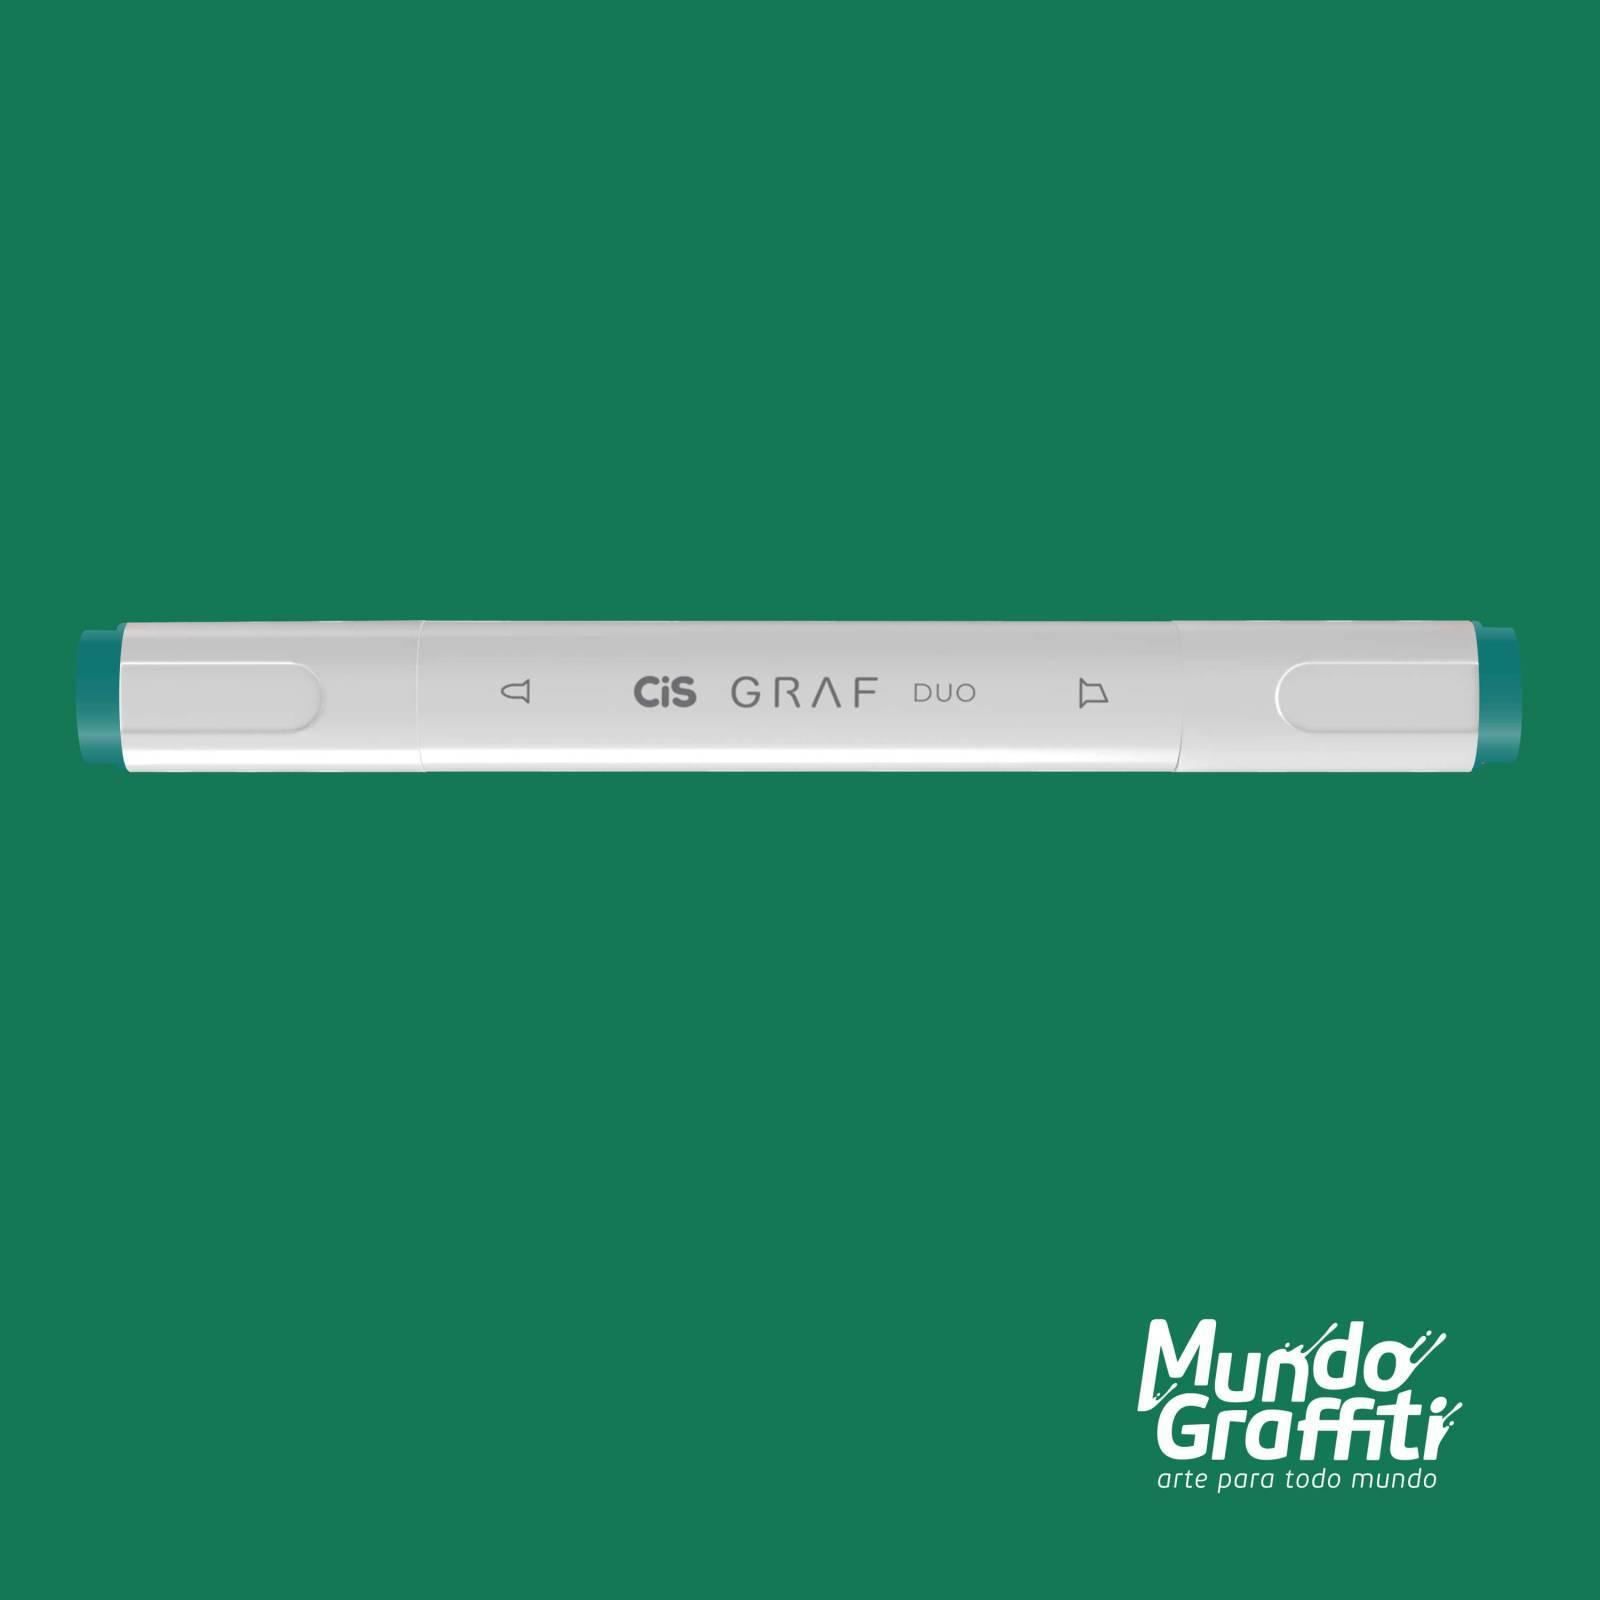 Marcador Cis Graf Duo Turquoise Green 53 - Mundo Graffiti